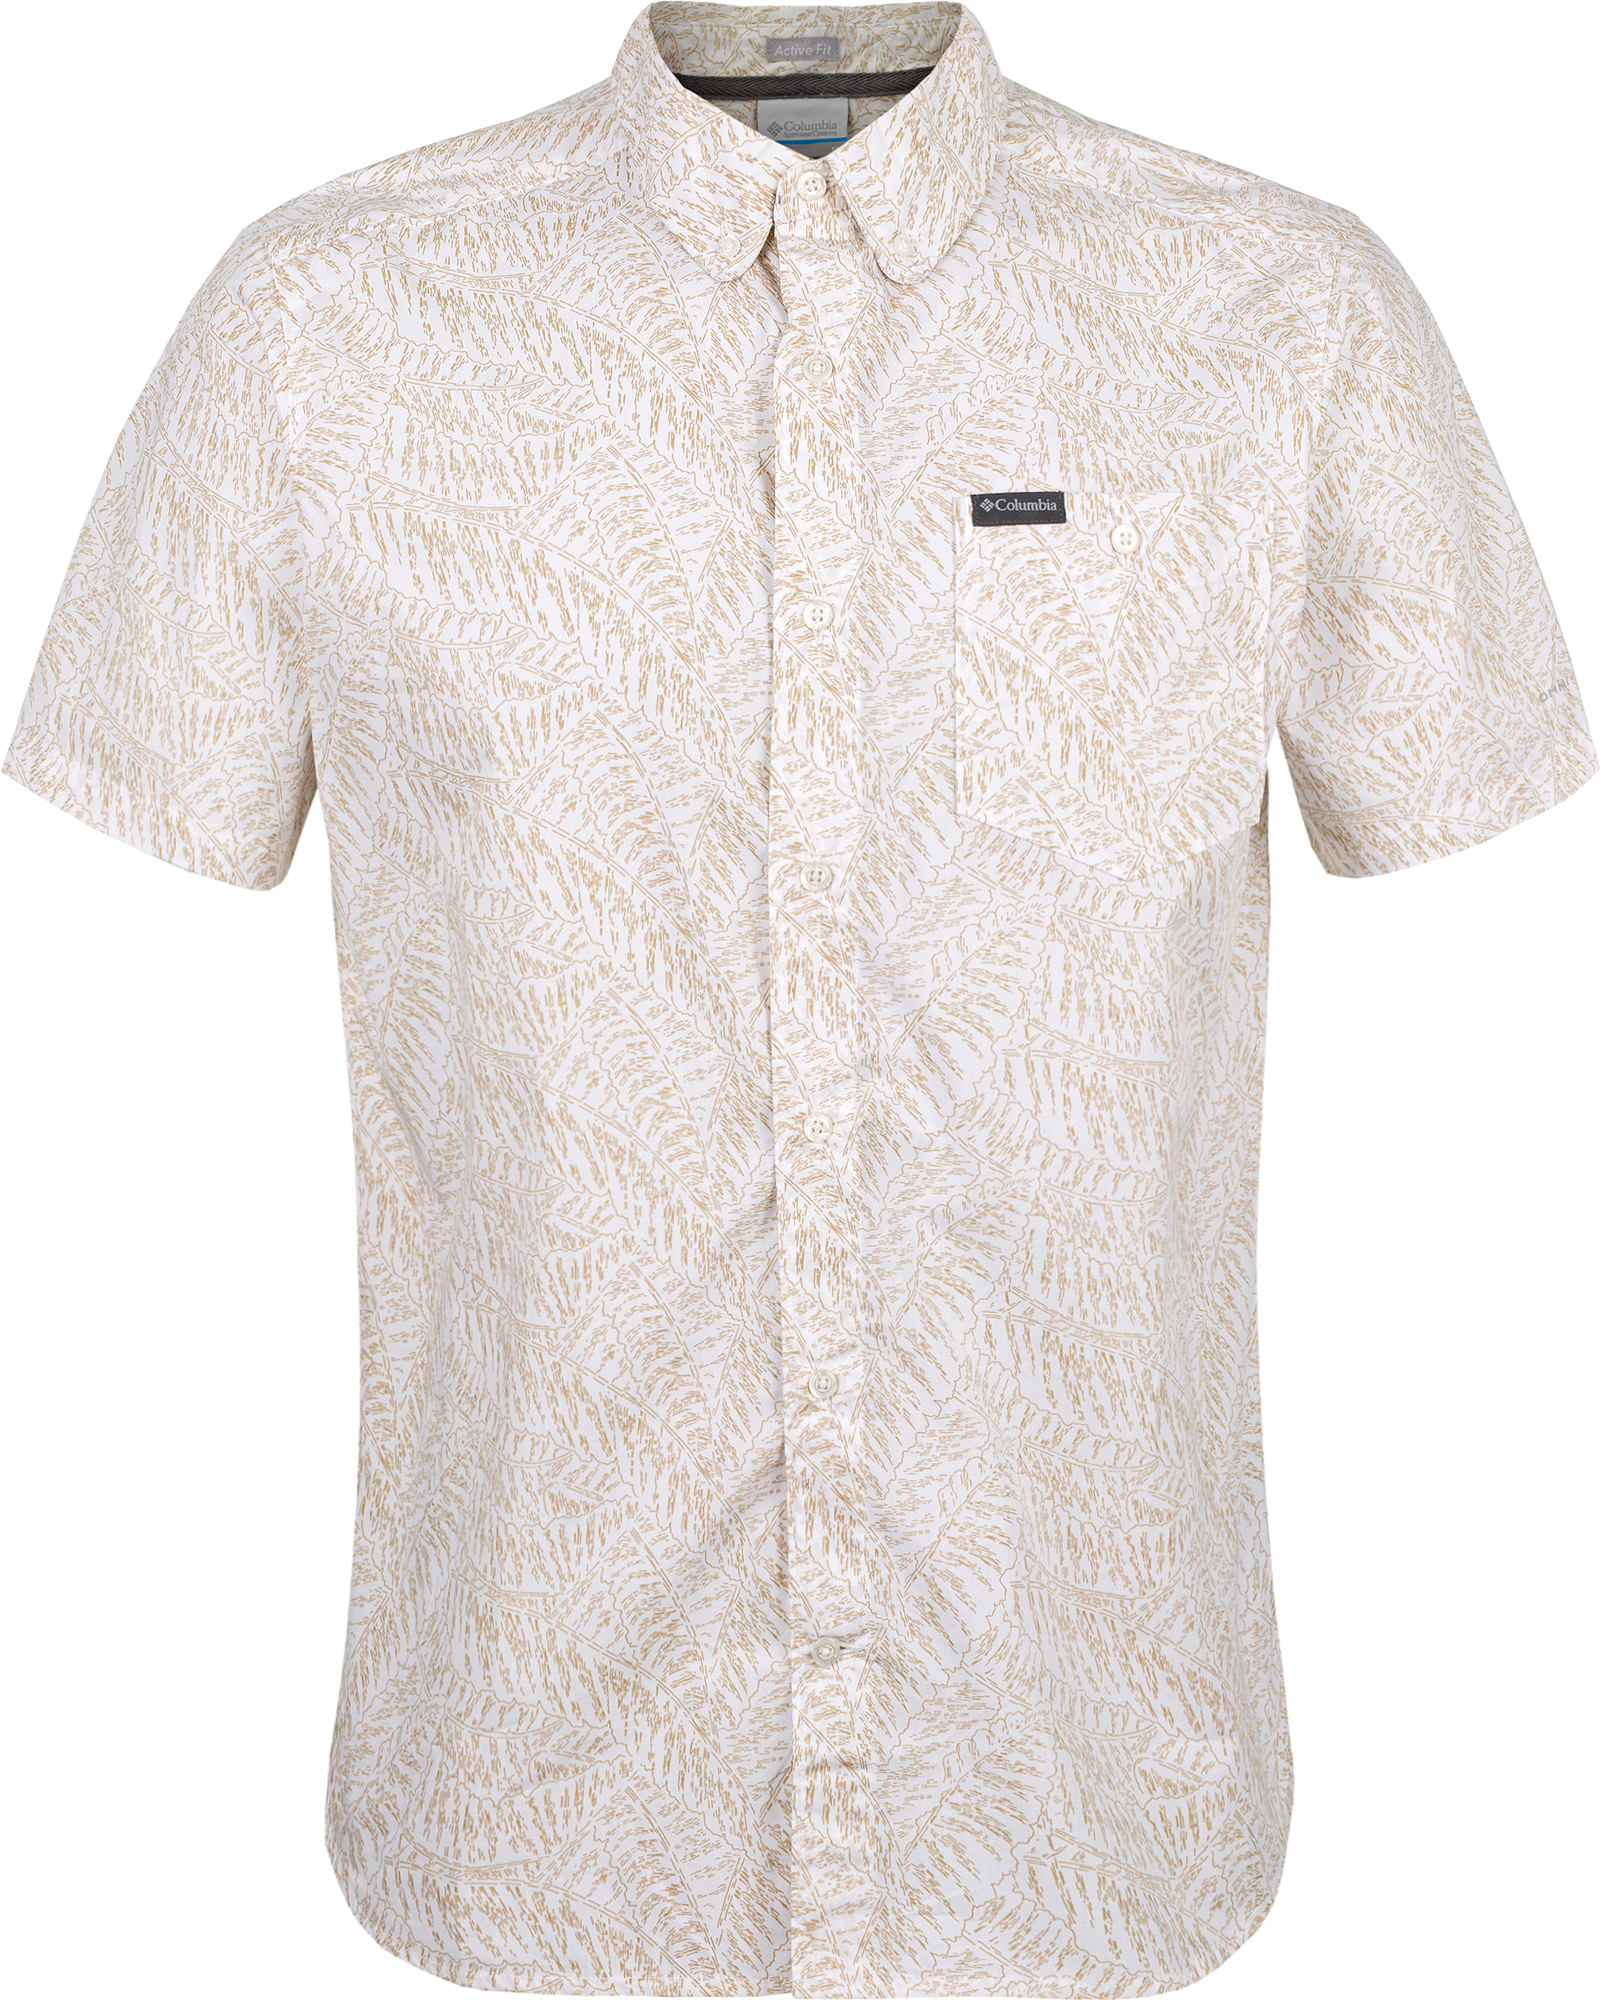 цена на Columbia Рубашка с коротким рукавом мужская Columbia Brentyn Trail II SS, размер 56